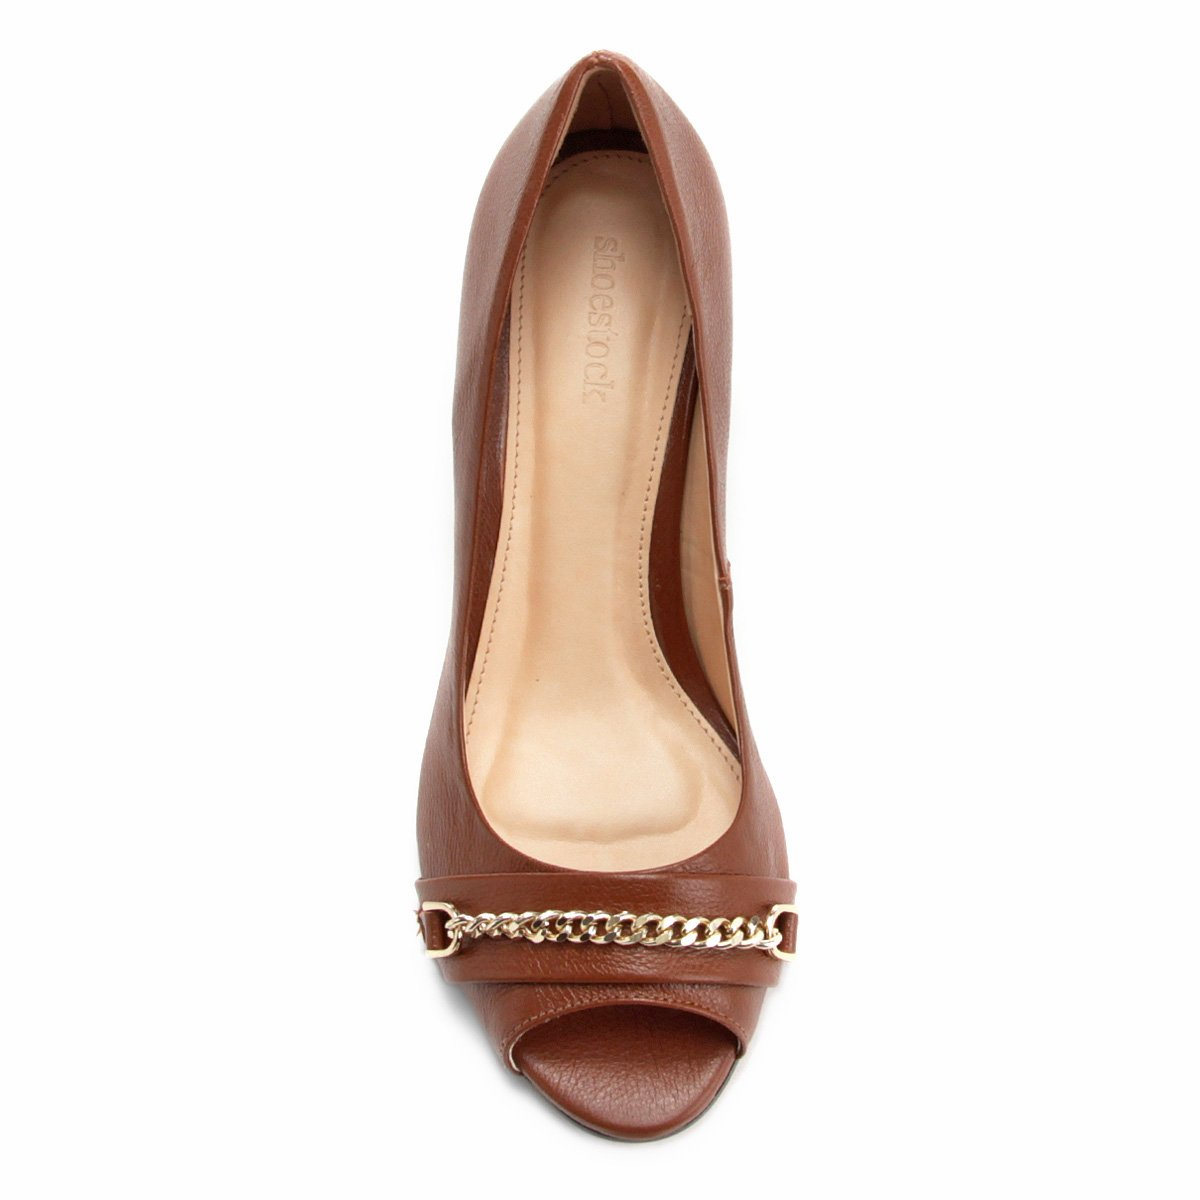 Toe Shoestock Peep Toe Tartaruga Couro Peep Marrom Salto Grosso BEqITx